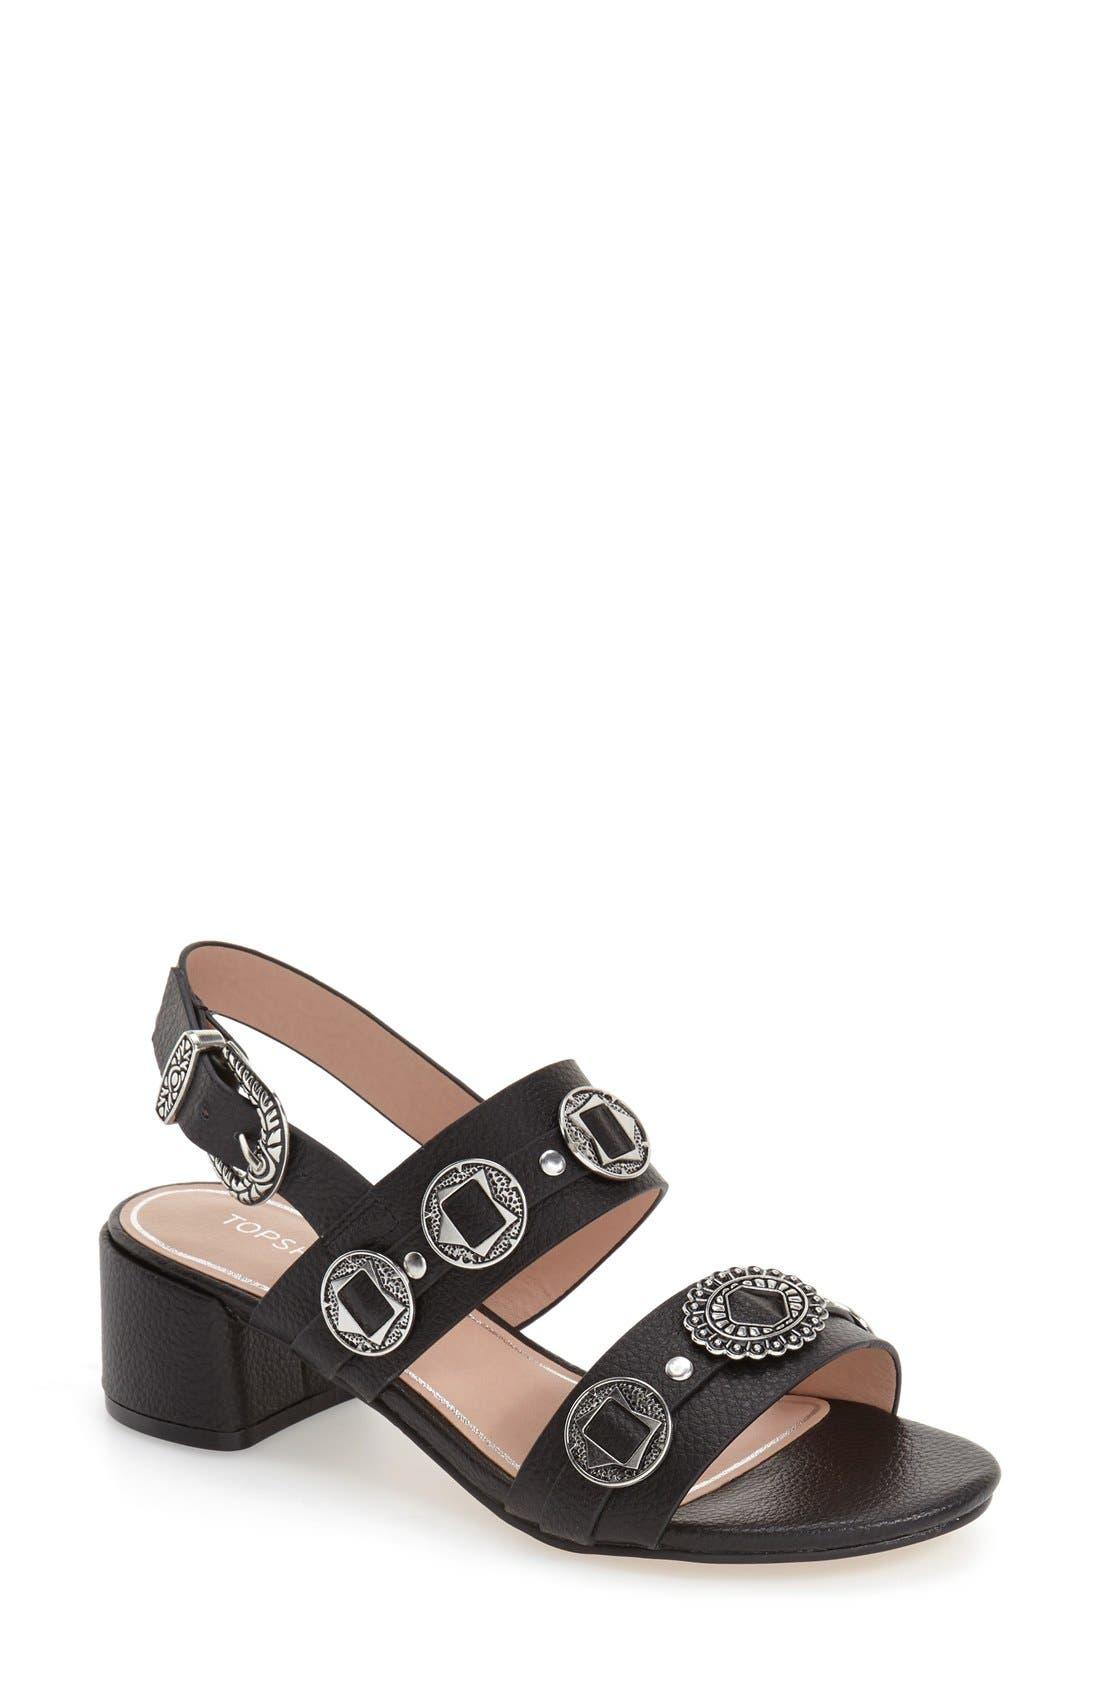 Alternate Image 1 Selected - Topshop 'Dandy' Block Heel Sandal (Women)